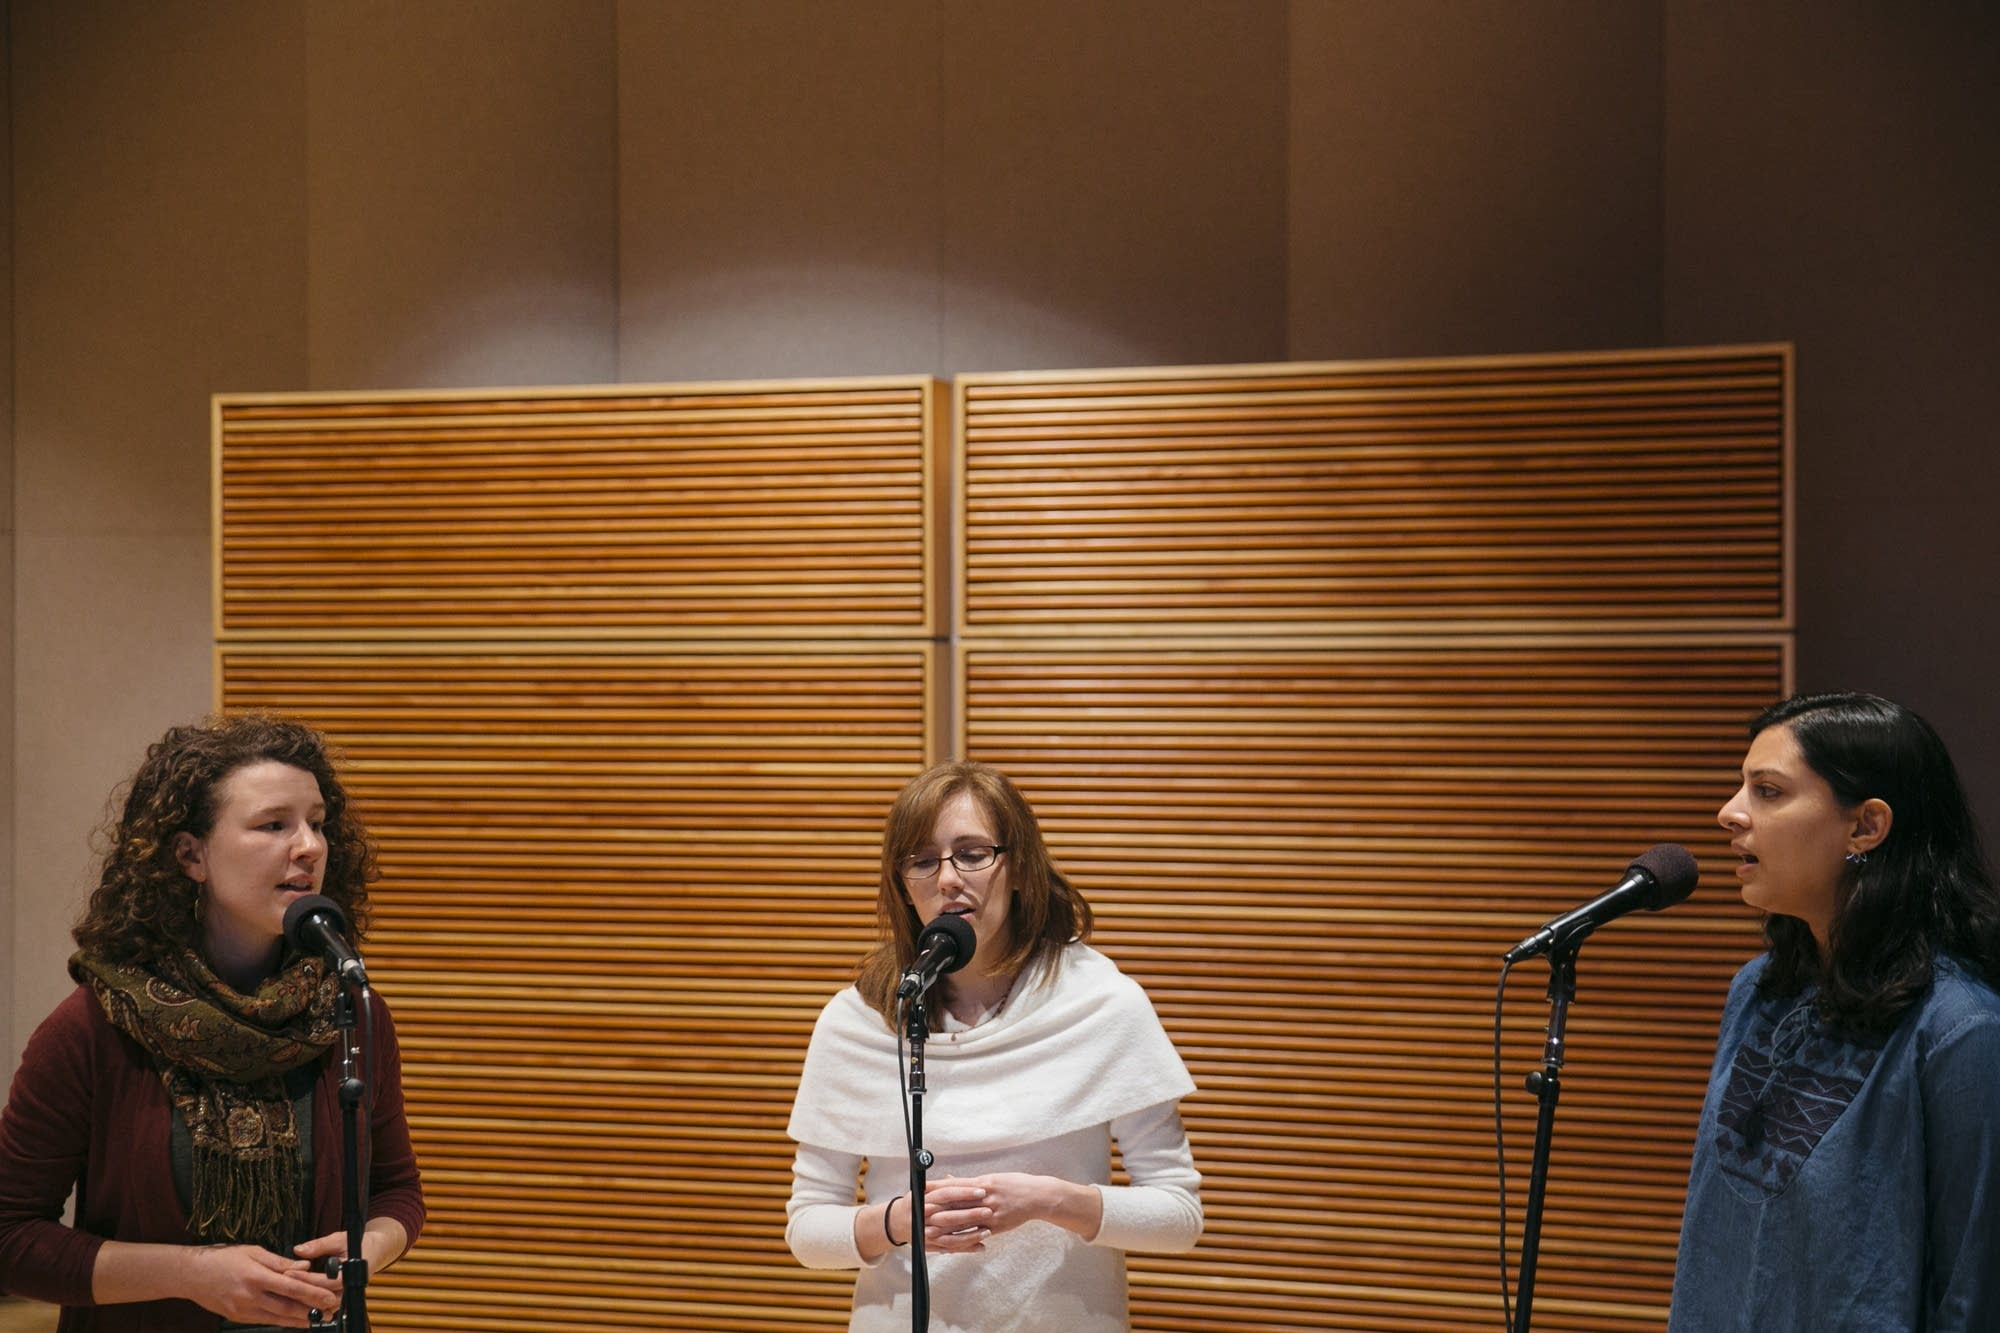 The Nightingale Trio performs in Studio M